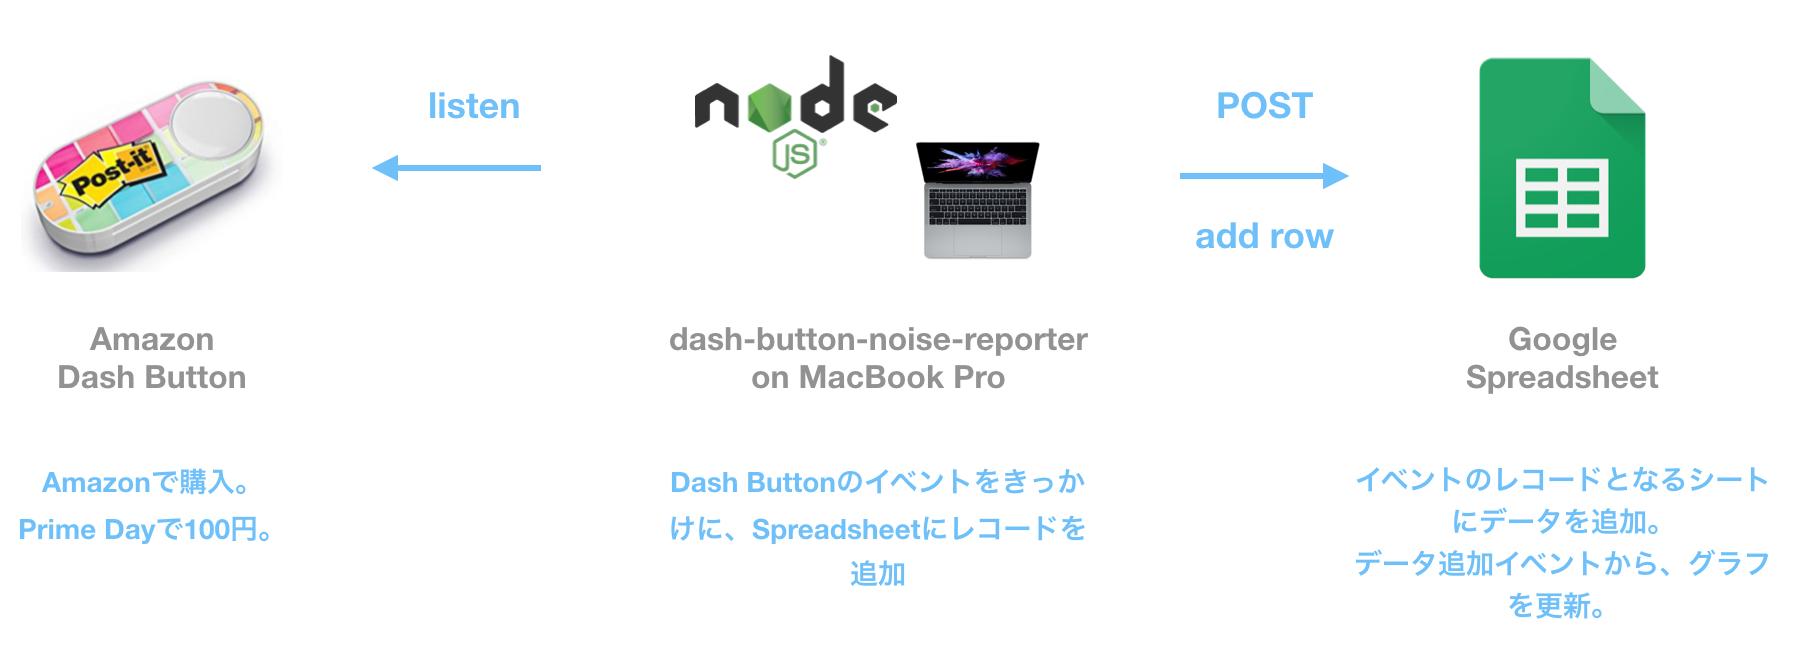 dash-button-architecture.png